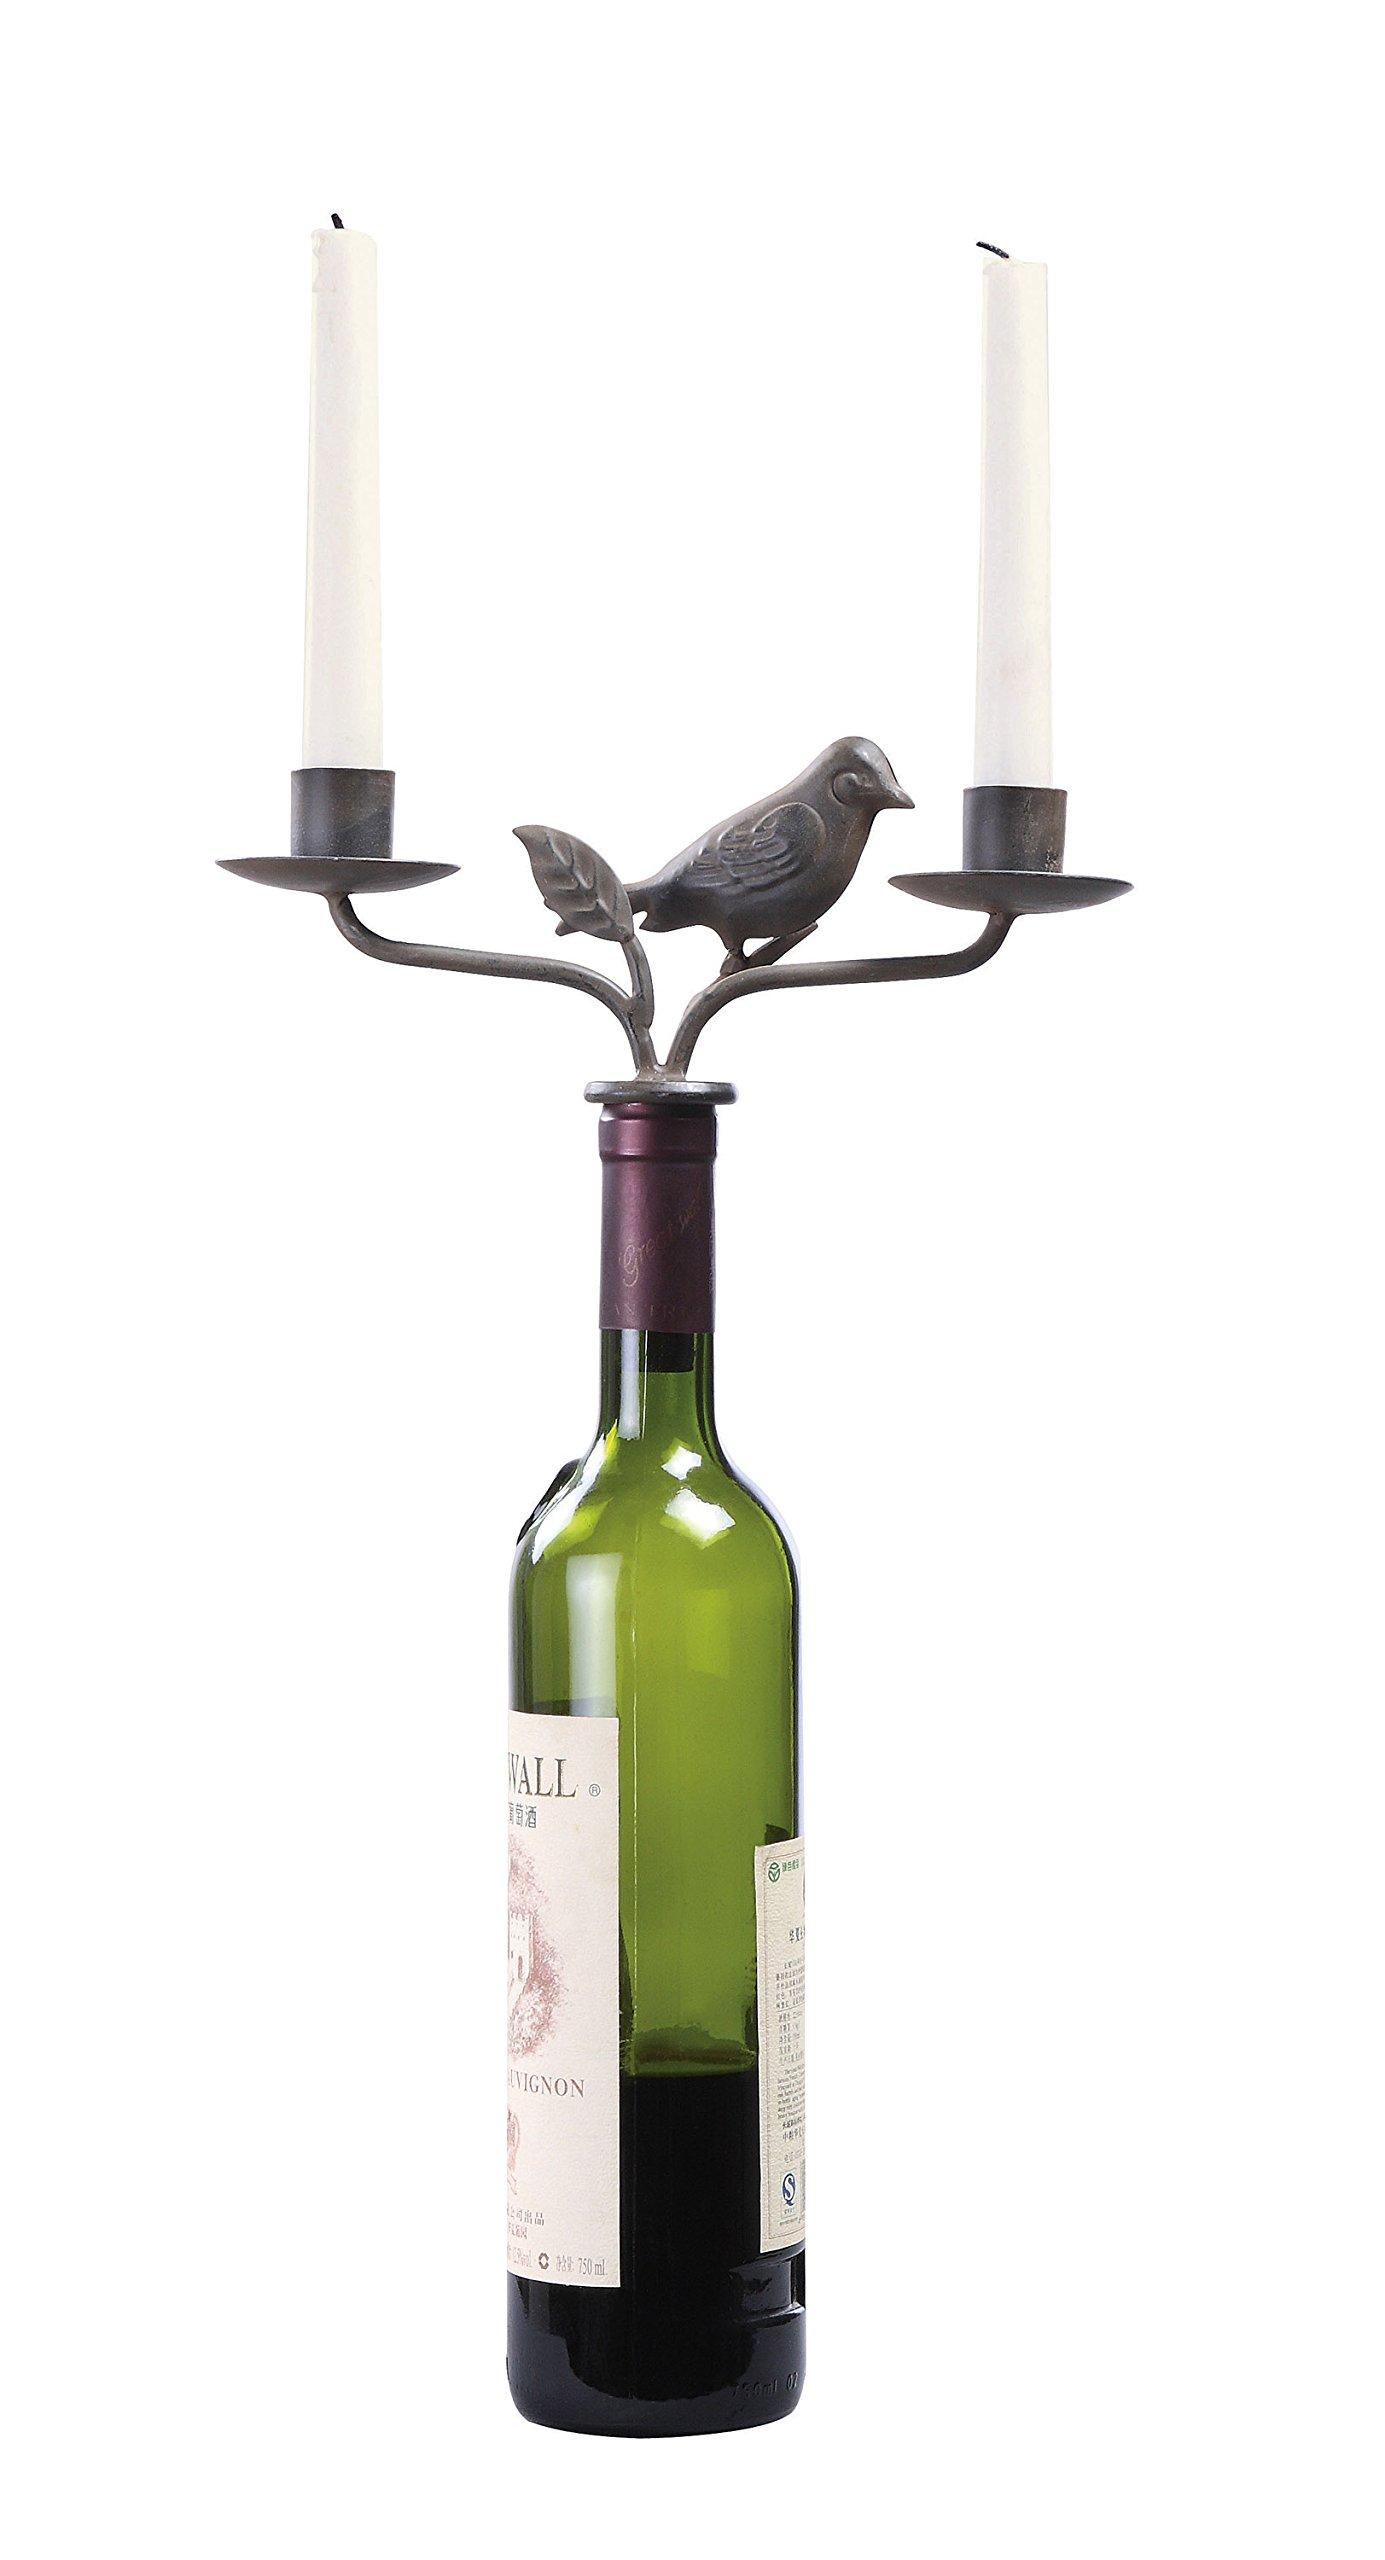 Creative Co-op HD5956 Bird Wine Stopper with Two Taper Holders, Rust Metal